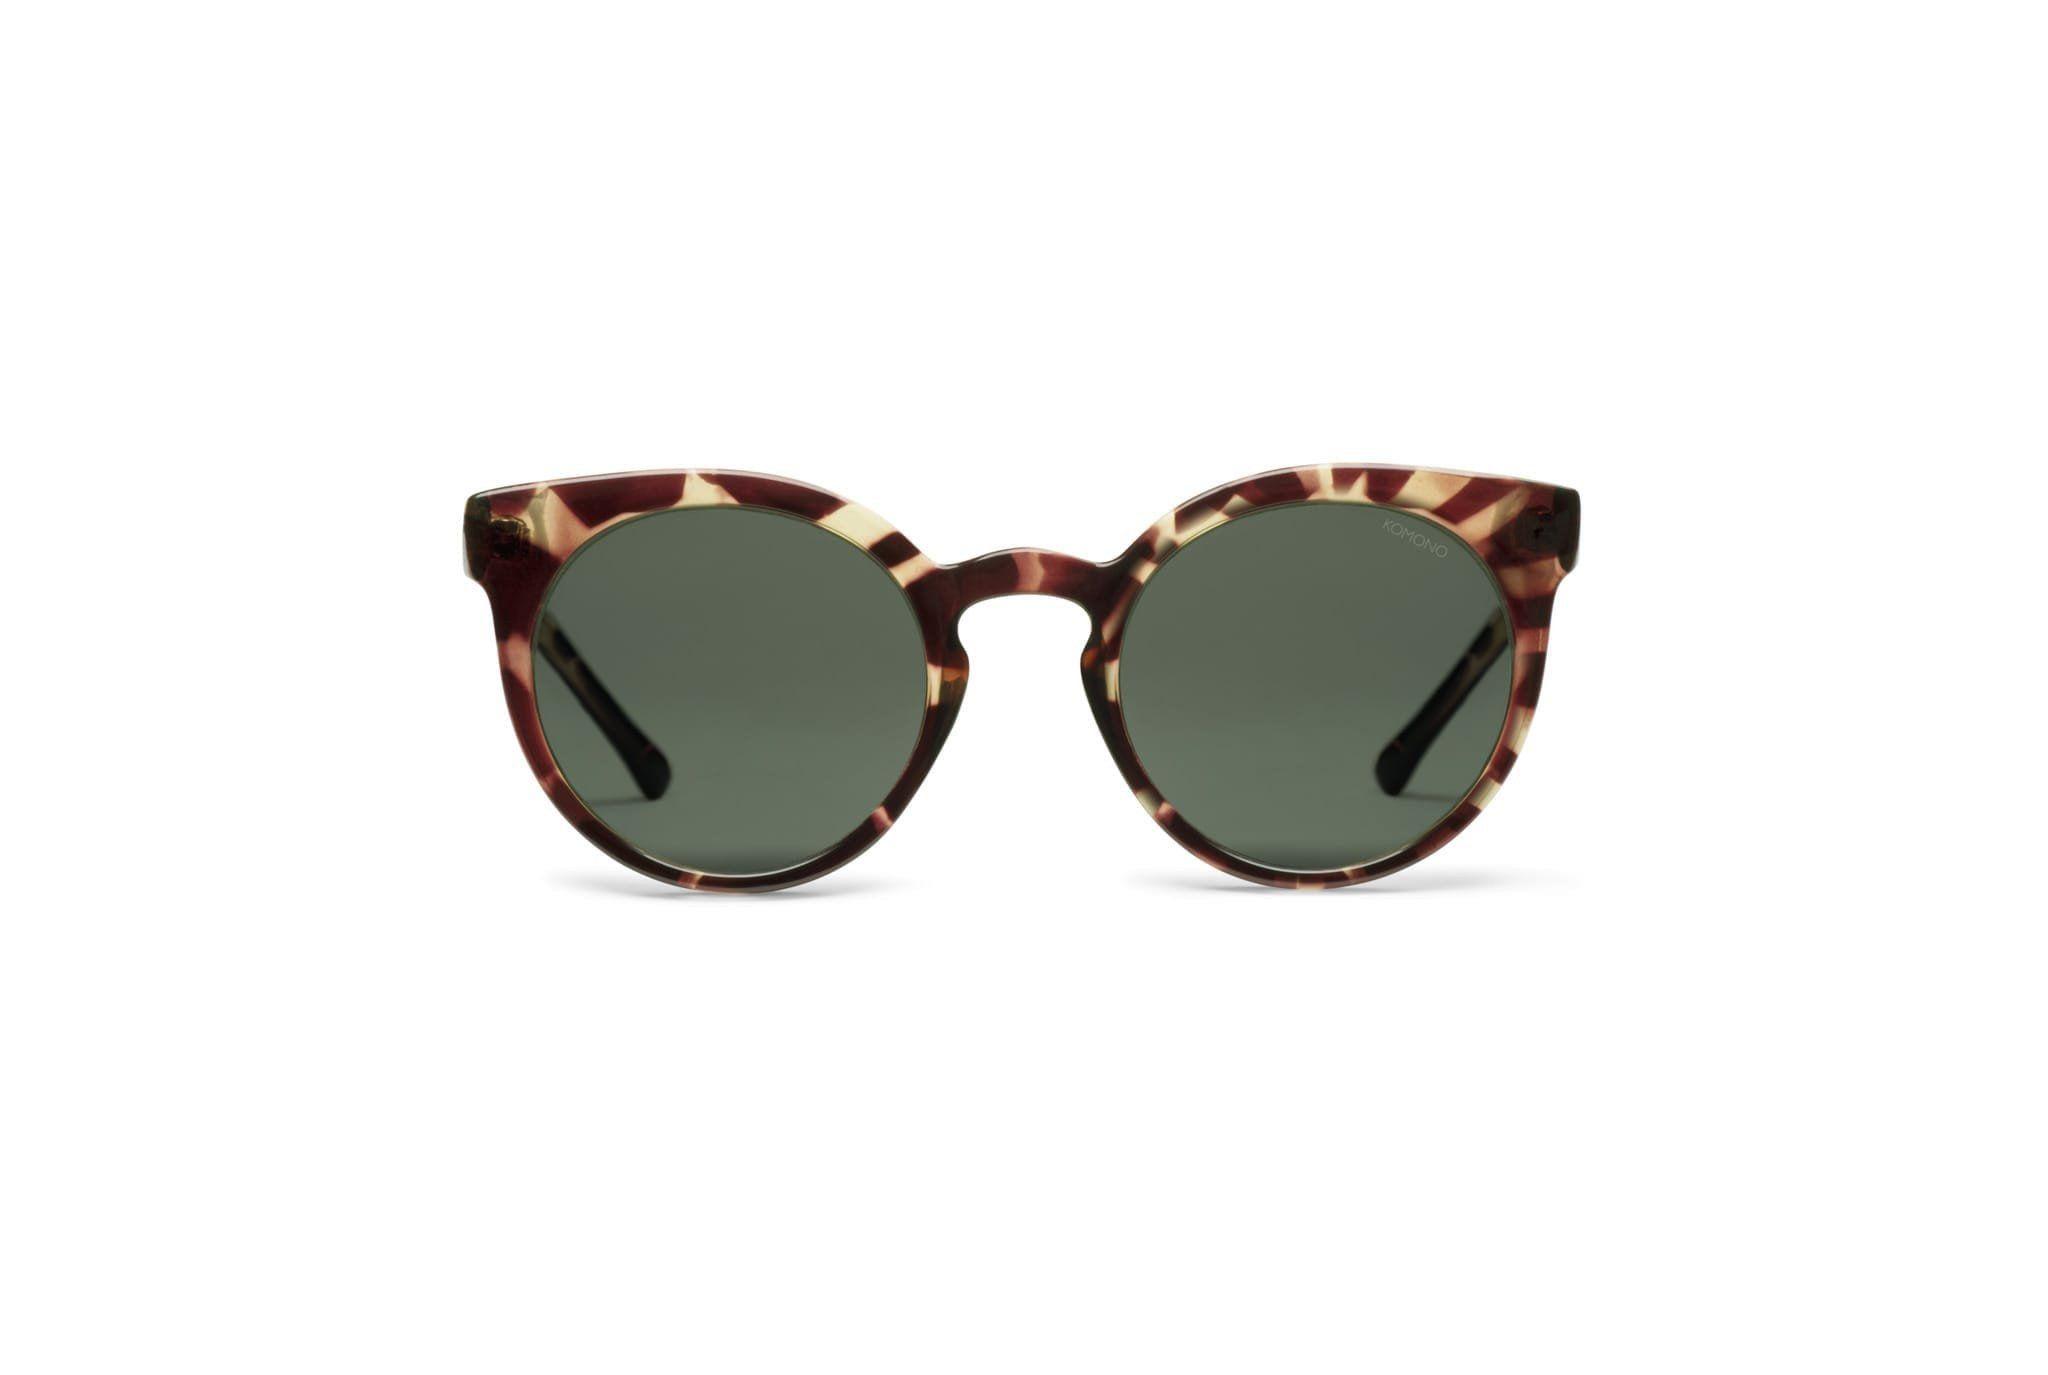 The Komono Lulu sunglasses have a slight upsweep at the edges. Classic and feminine sunglasses for women.